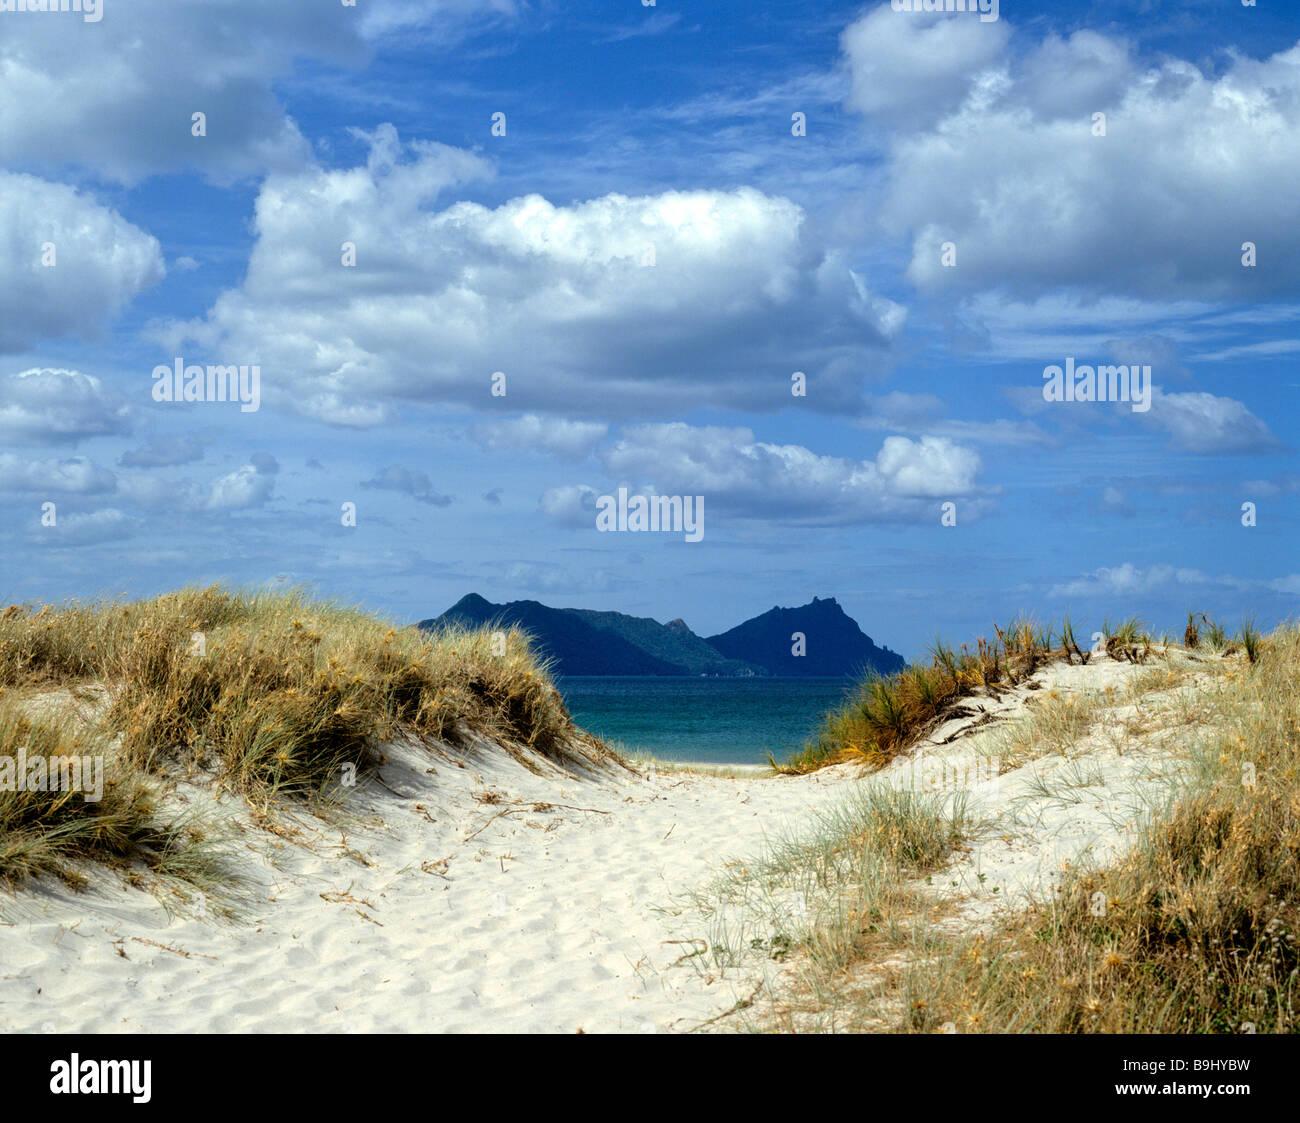 Dunes and ocean, North Island, New Zealand - Stock Image